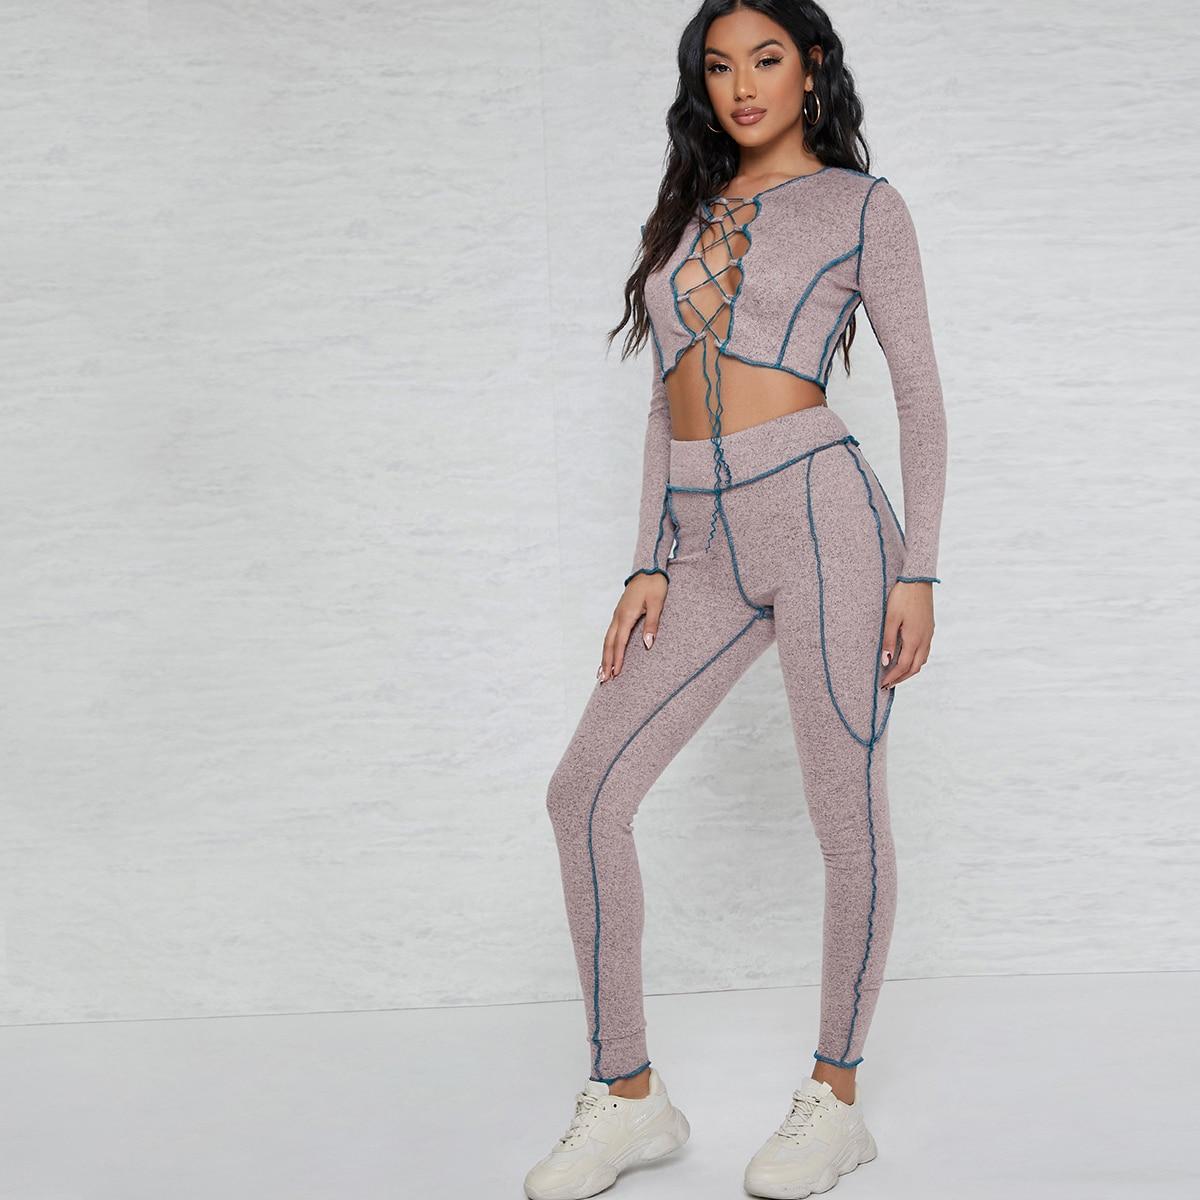 SHEIN / Contrast Stitch Lace-Up Crop Top & Leggings Set